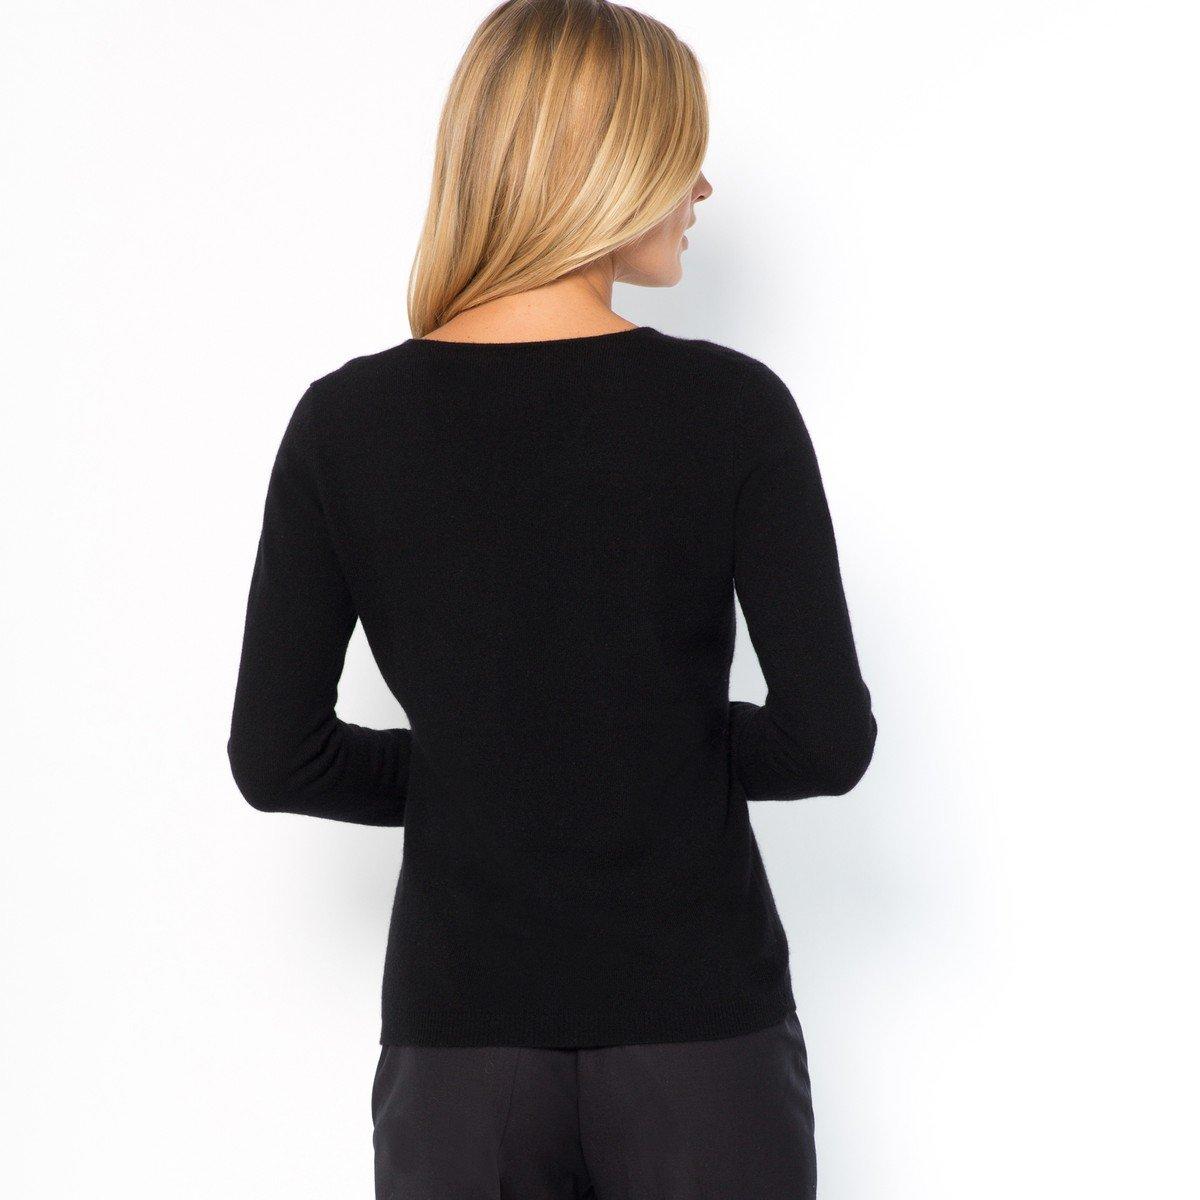 La Redoute Womens Fine Knit Cashmere V-Neck Jumper/Sweater Black Size Us 16/18 - Fr 46/48 by La Redoute (Image #2)